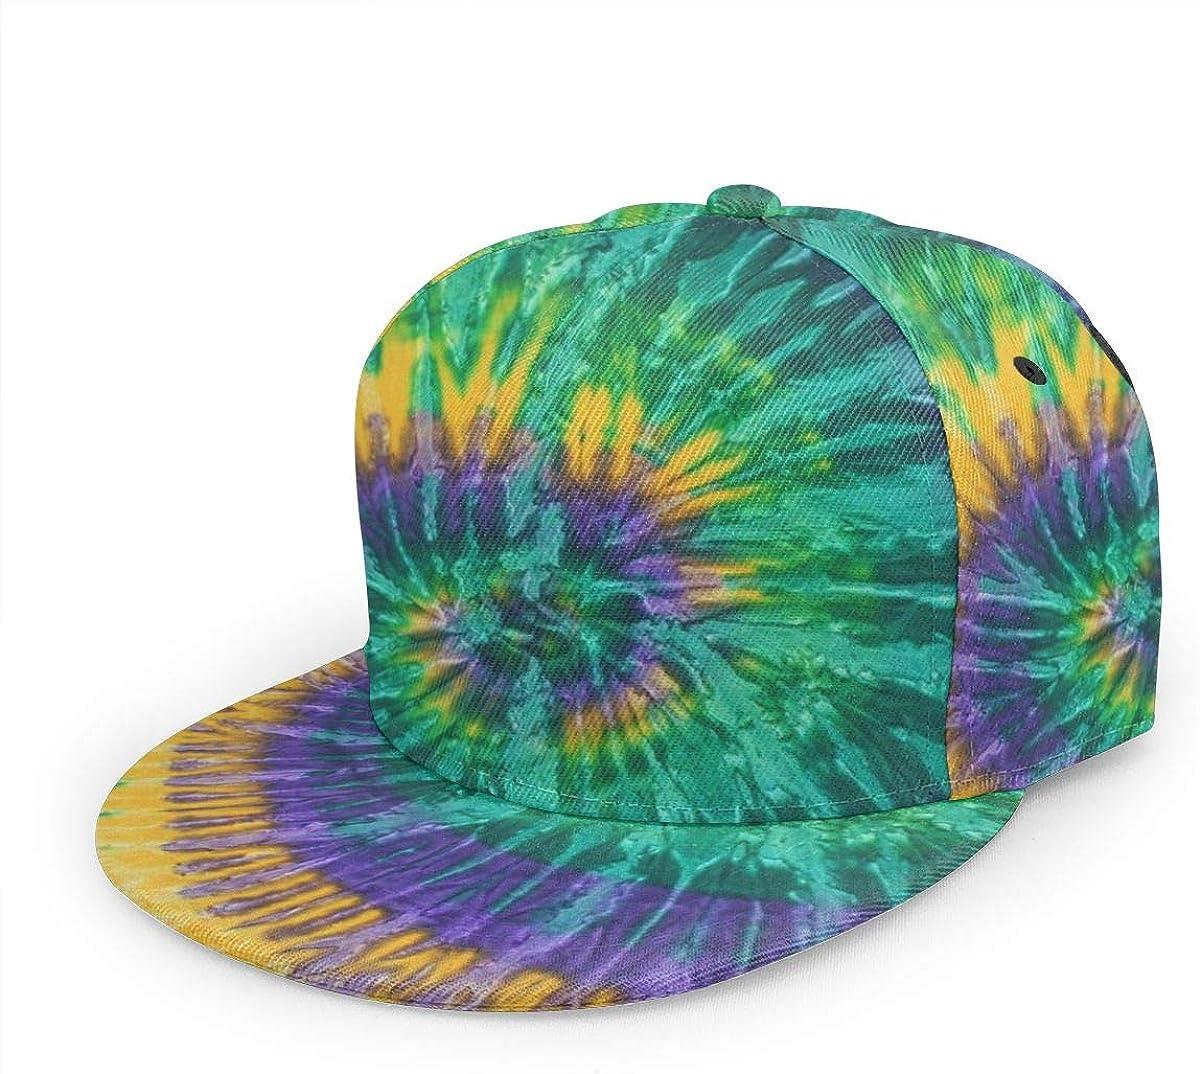 BWBFVPW New color Tie Dye Discount mail order Hip Hop Flat Cap Adjustable Brim Baseba Snapback